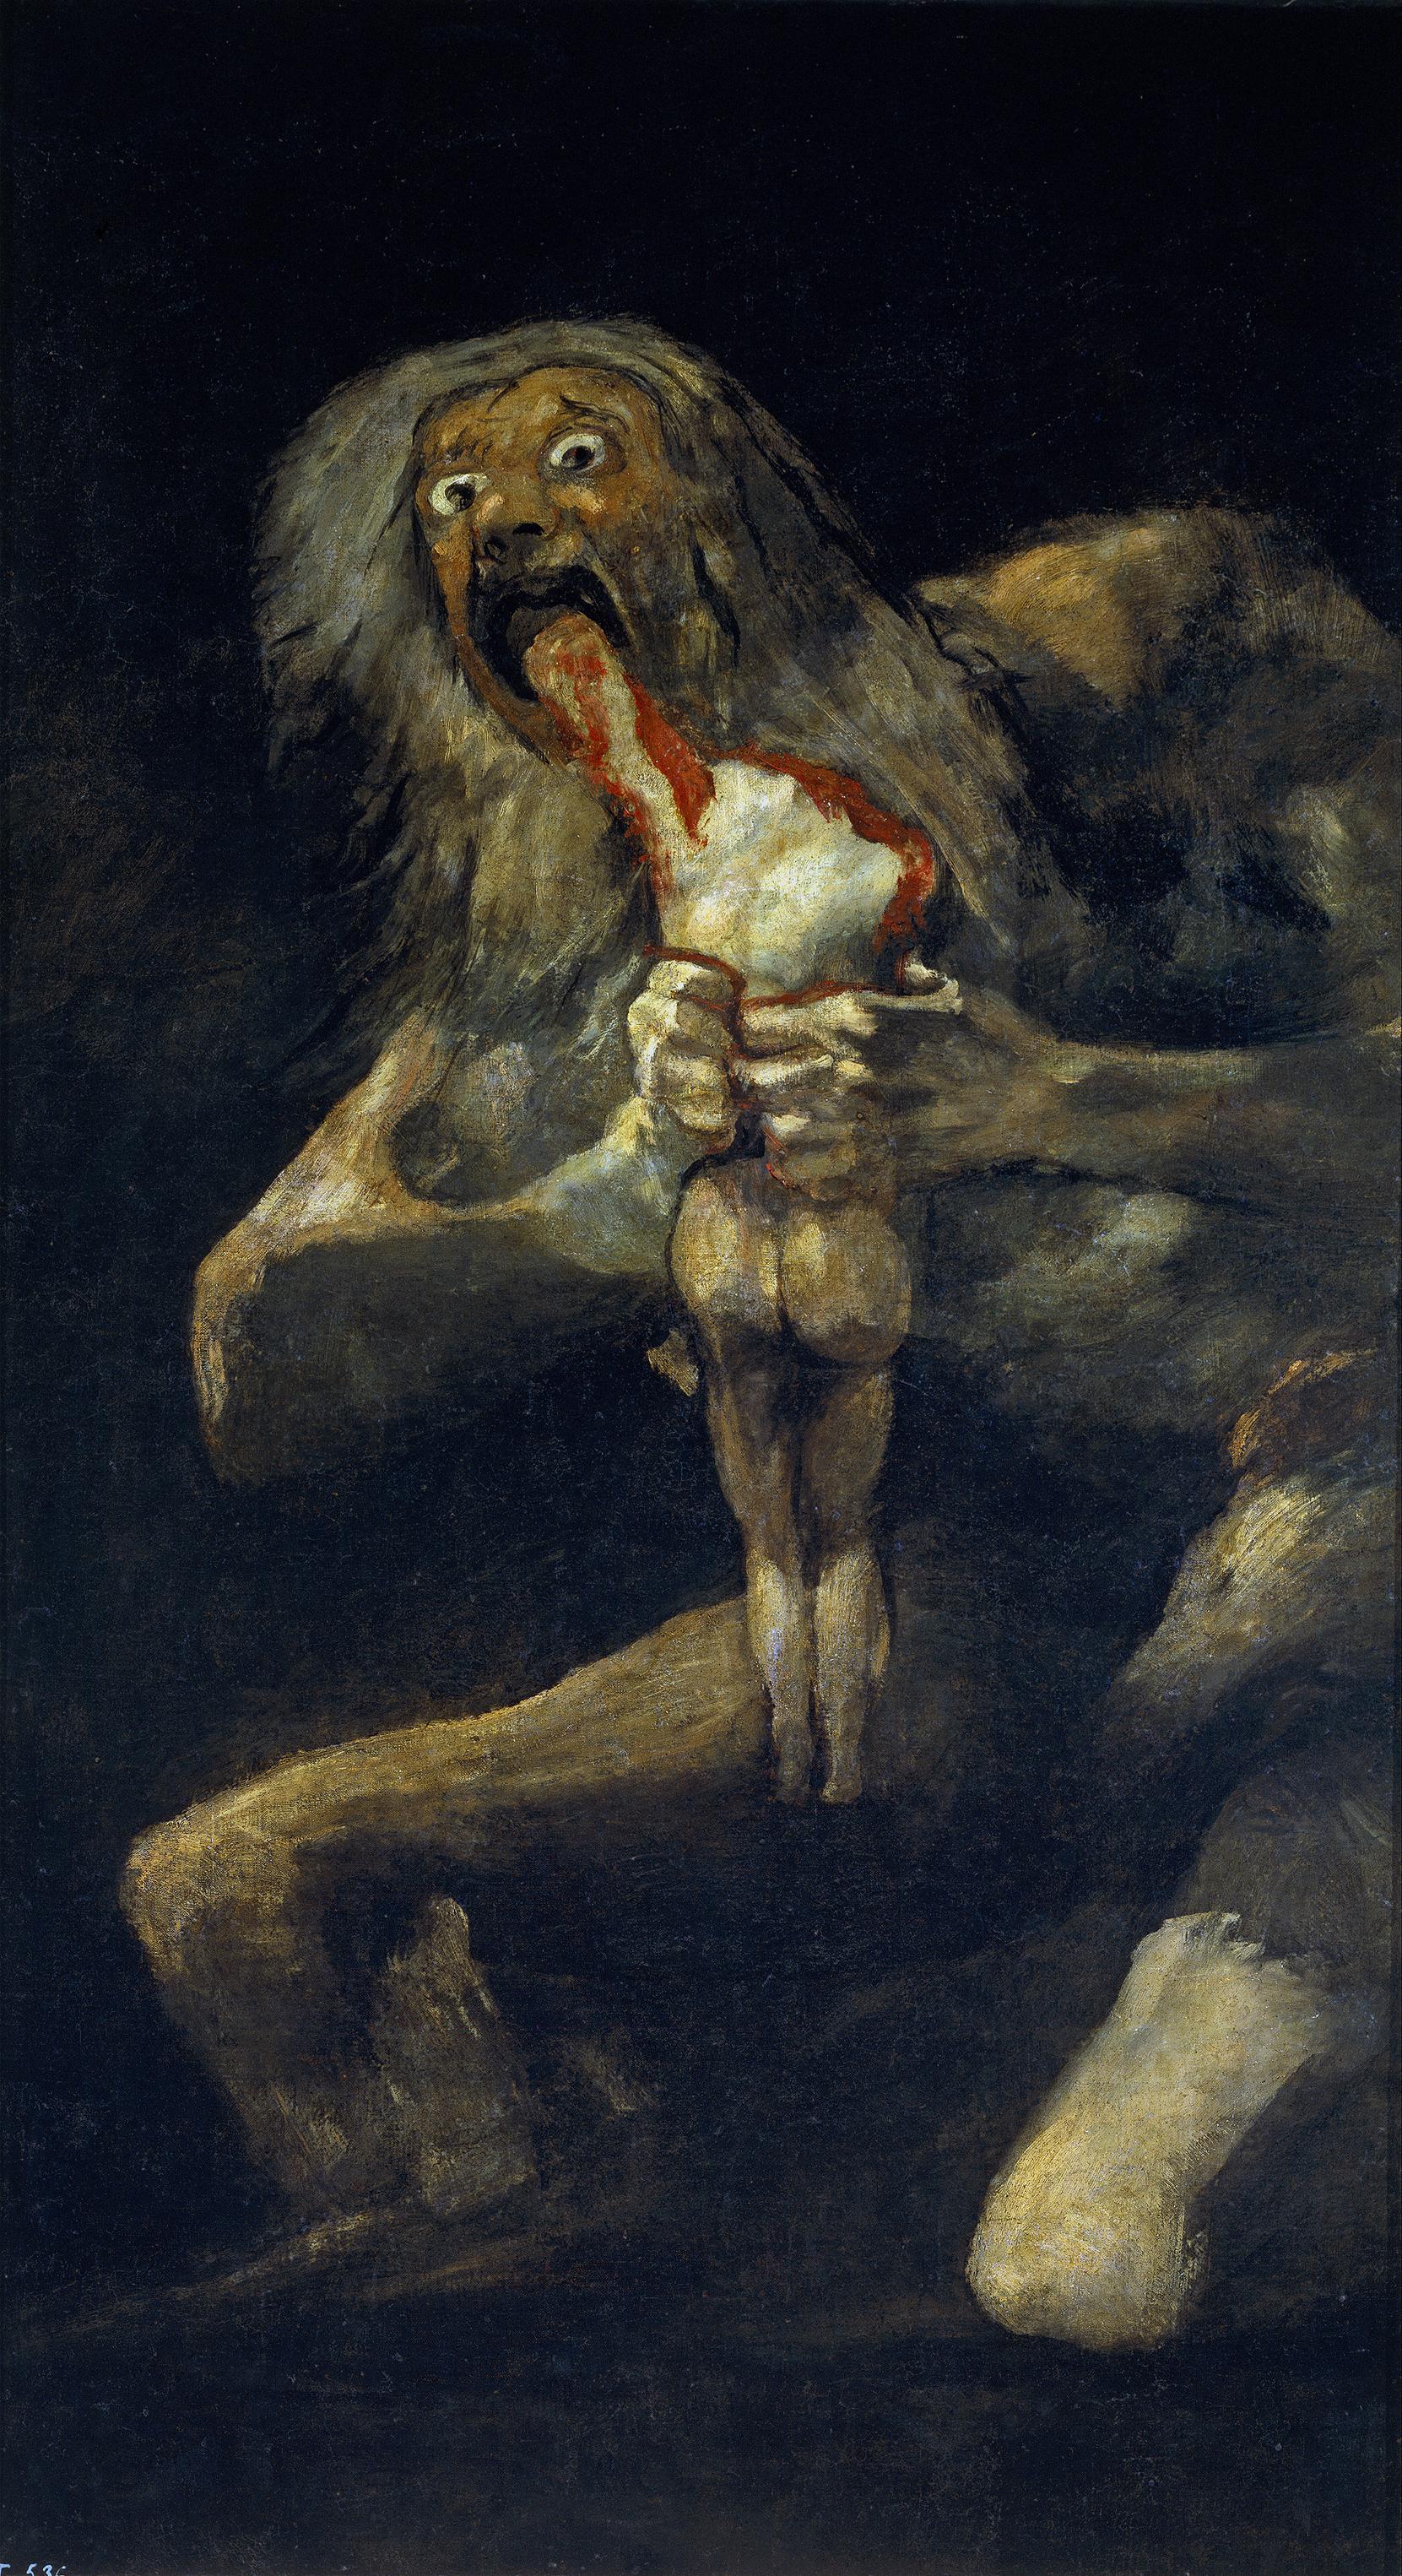 https://i2.wp.com/upload.wikimedia.org/wikipedia/commons/8/82/Francisco_de_Goya%2C_Saturno_devorando_a_su_hijo_%281819-1823%29.jpg